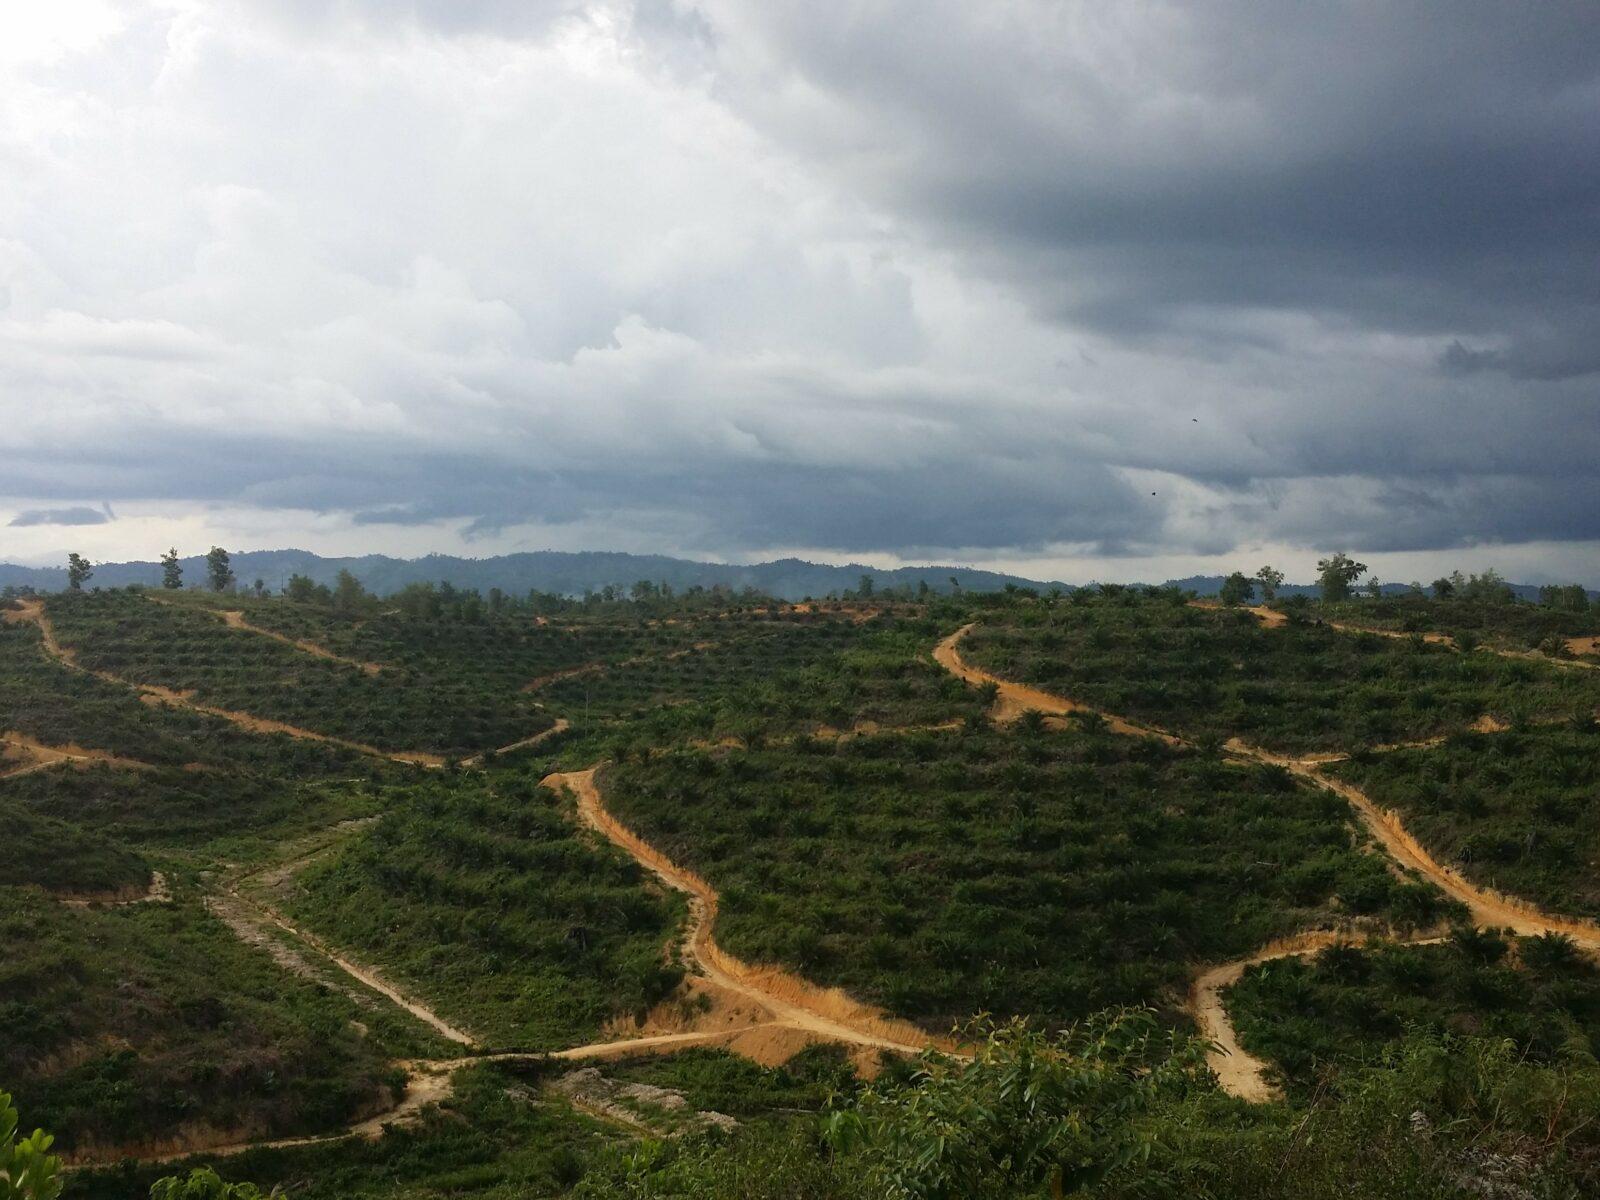 Palmolja, Olja, Oljepalm, Malaysia, Plantage, Odling, Exploatering, Palm oil, Oil, Palm trees, Träd